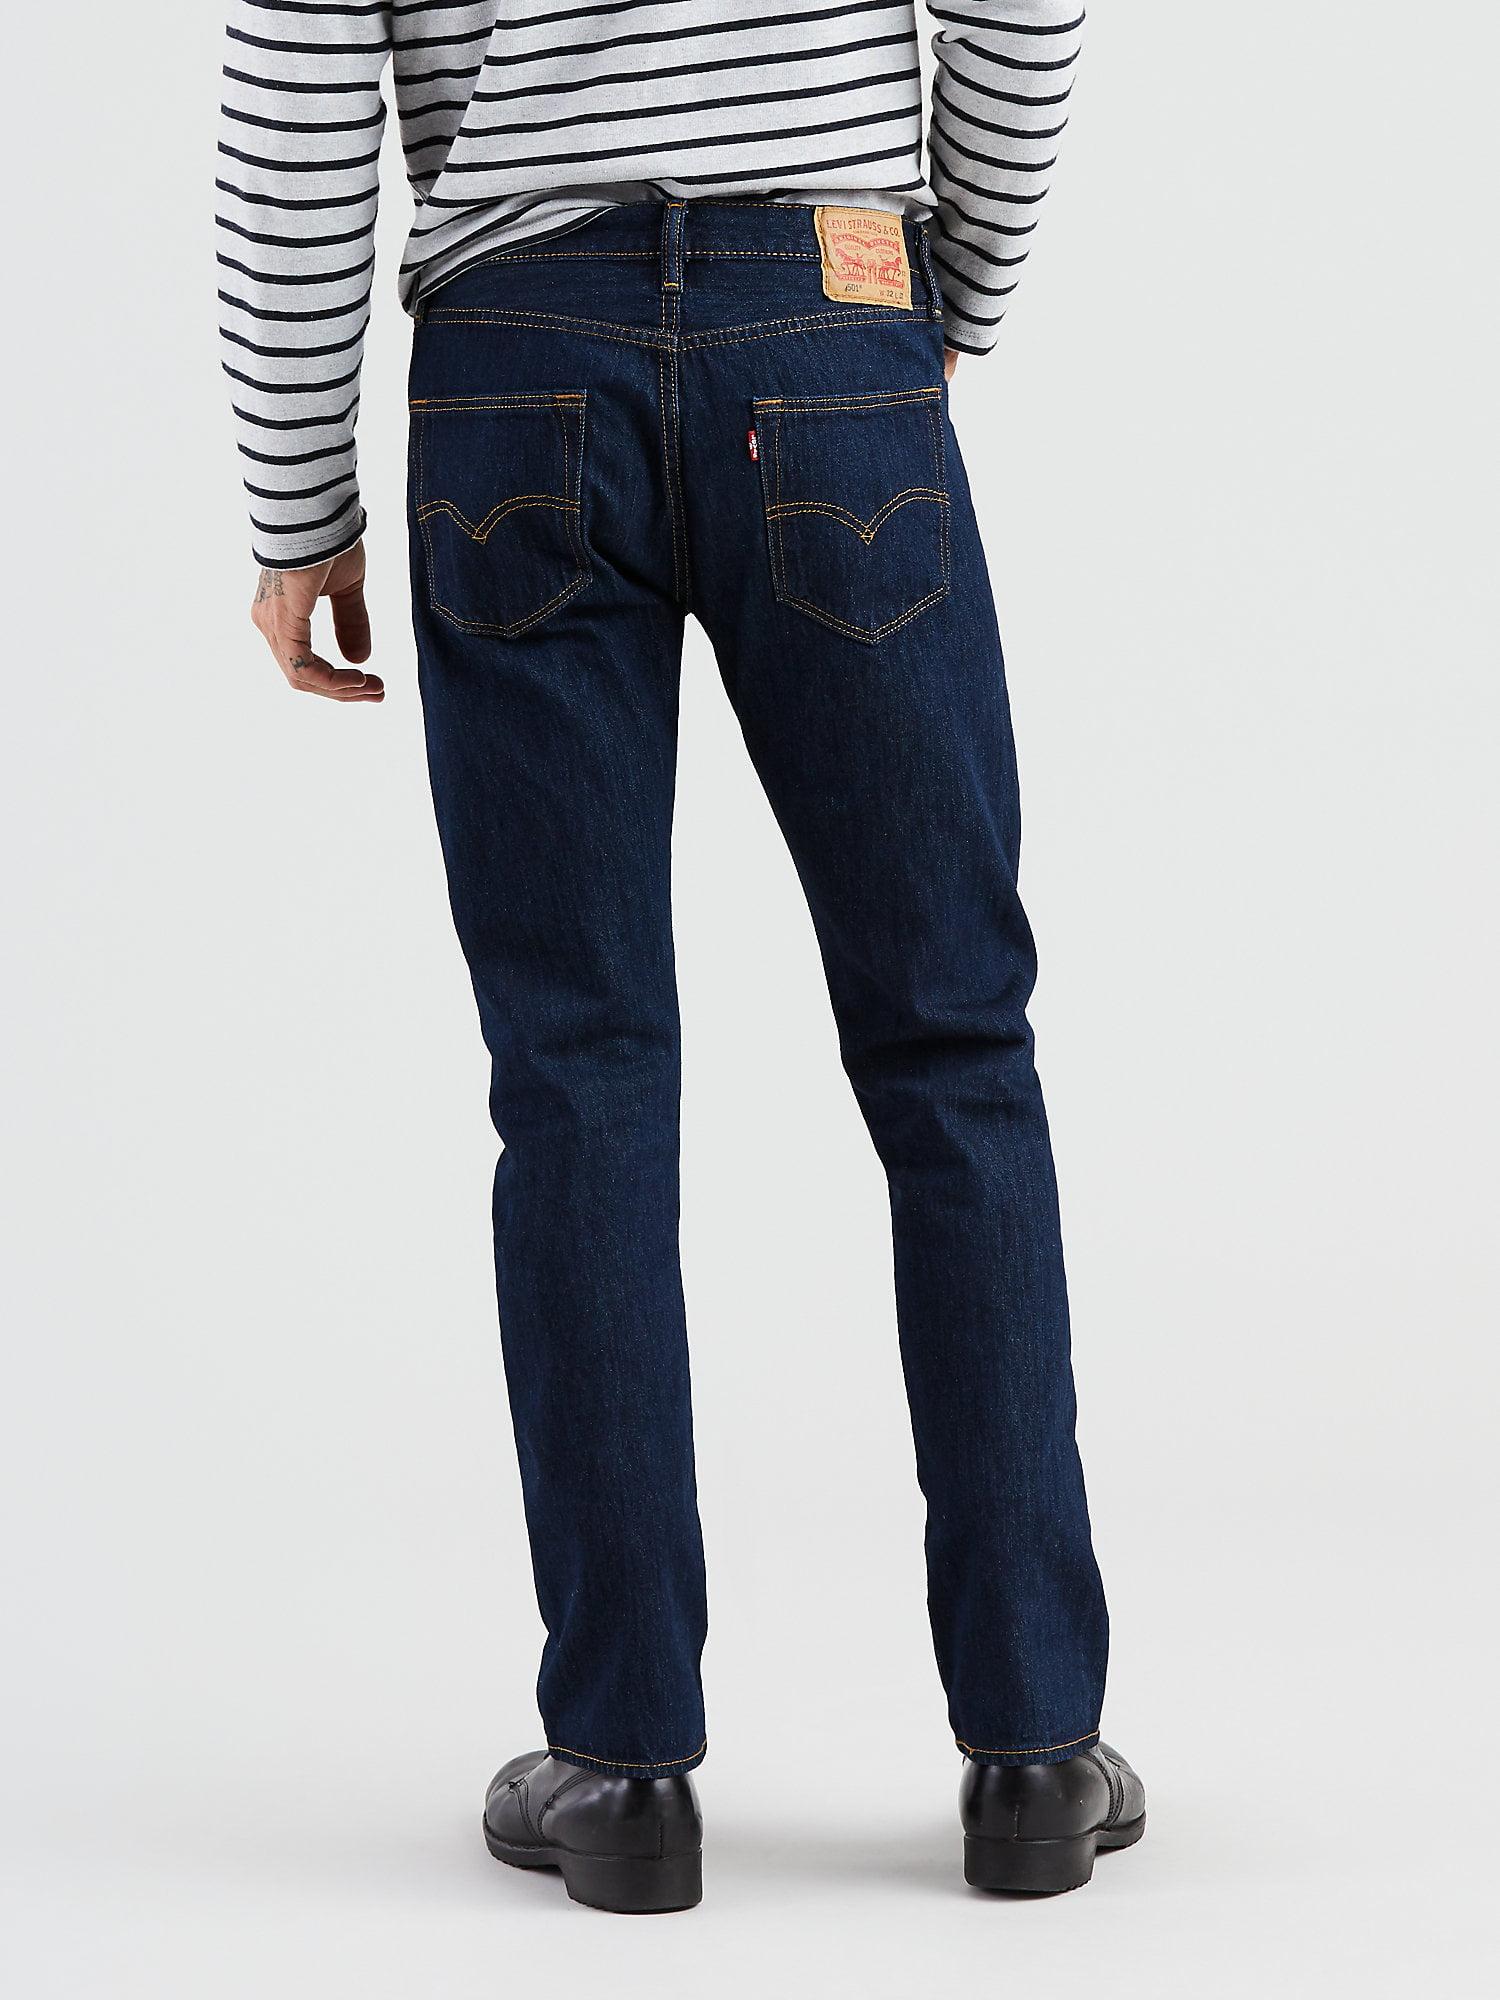 b7469c2c Levi's - Levi's Men's 501 Original Fit Jeans - Walmart.com